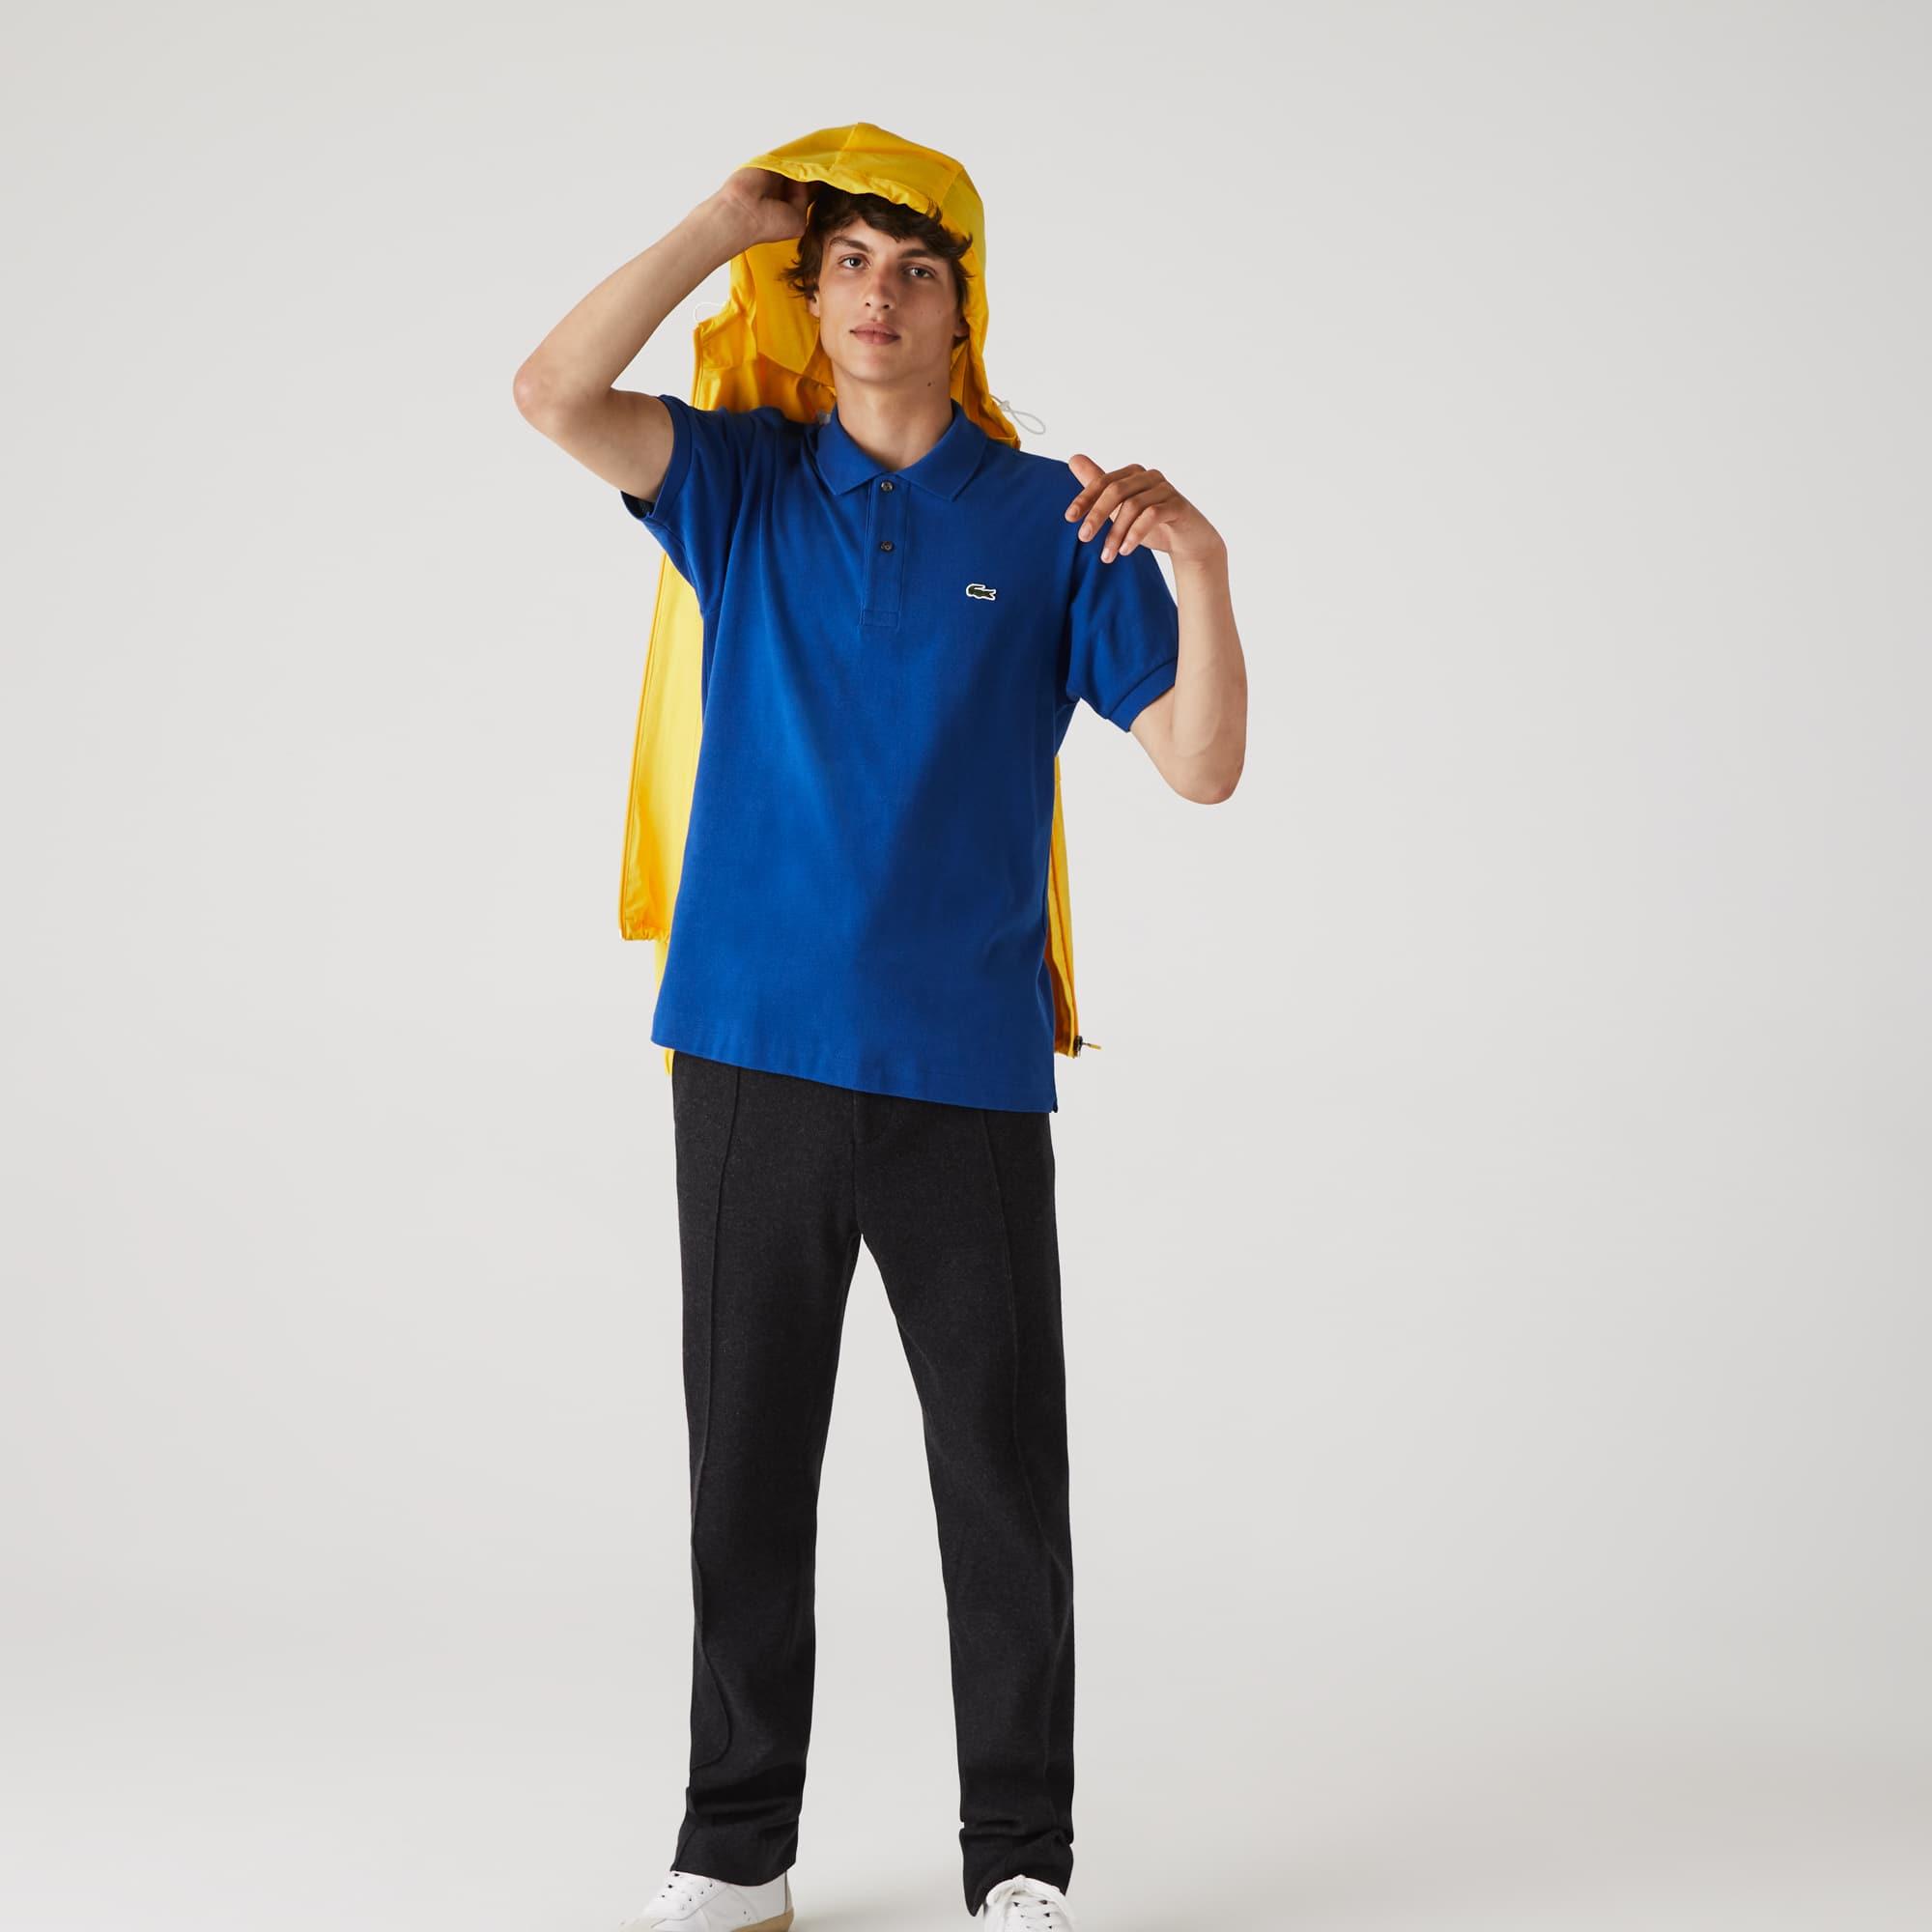 6c69c2bb68199 Camisas polo de manga curta   Moda Masculina   LACOSTE